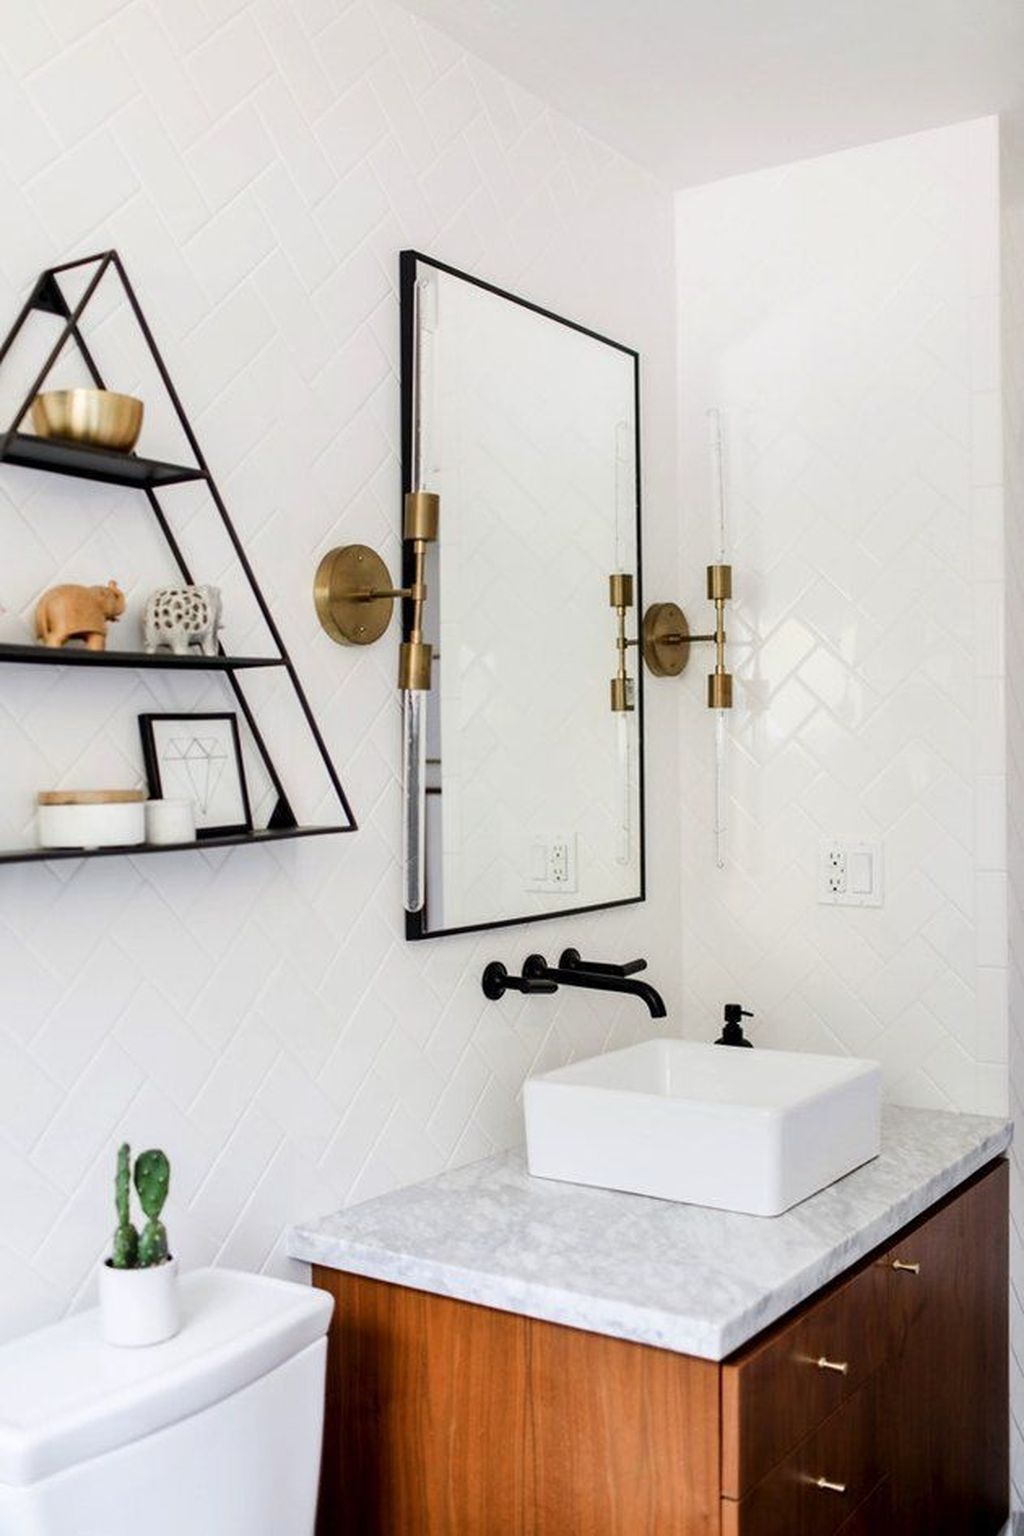 Admirable Rustic Modern Bathroom Design And Decor Ideas 11